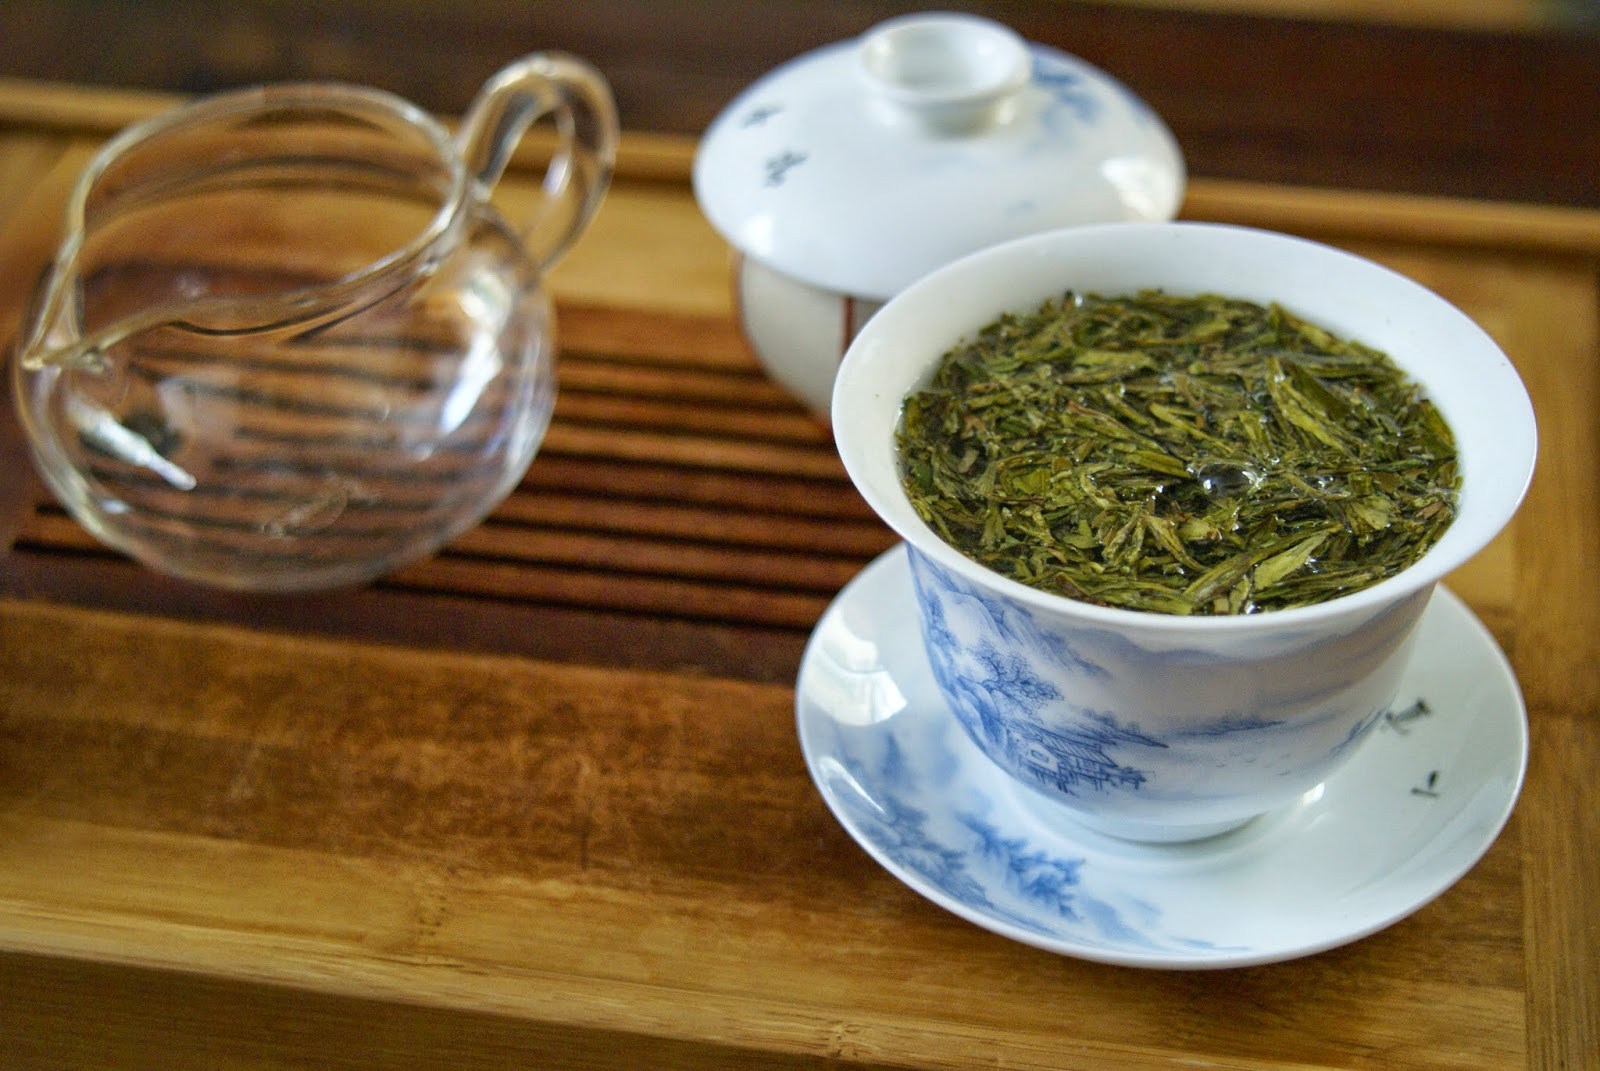 bateau à thé ou plateau à thé